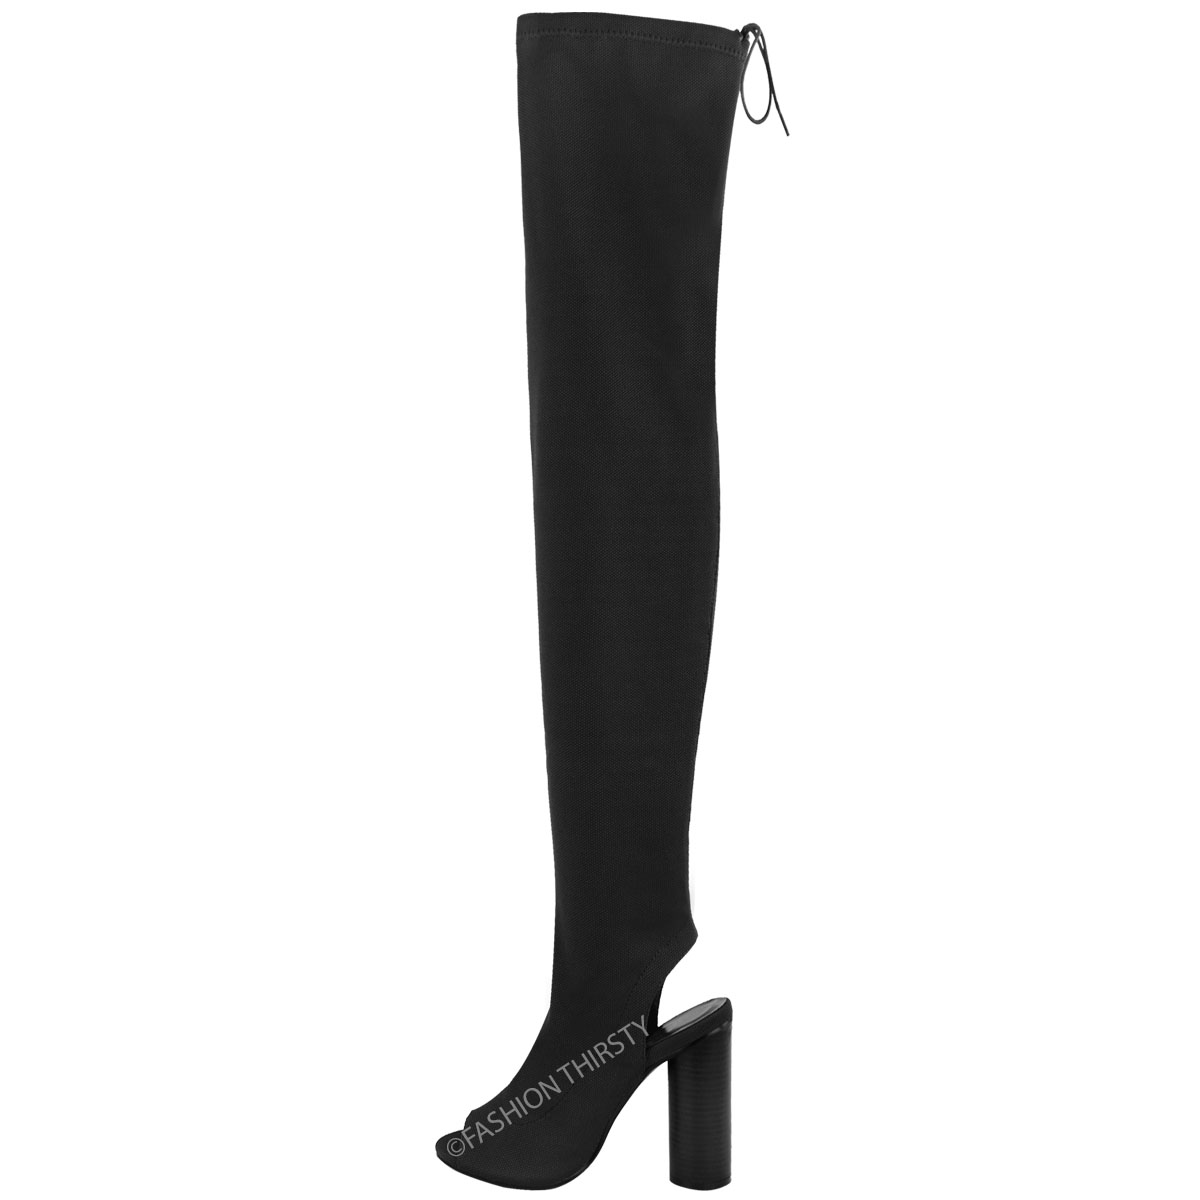 bottes cuissardes pour femme talons larges tissu en tricot lastiqu ebay. Black Bedroom Furniture Sets. Home Design Ideas